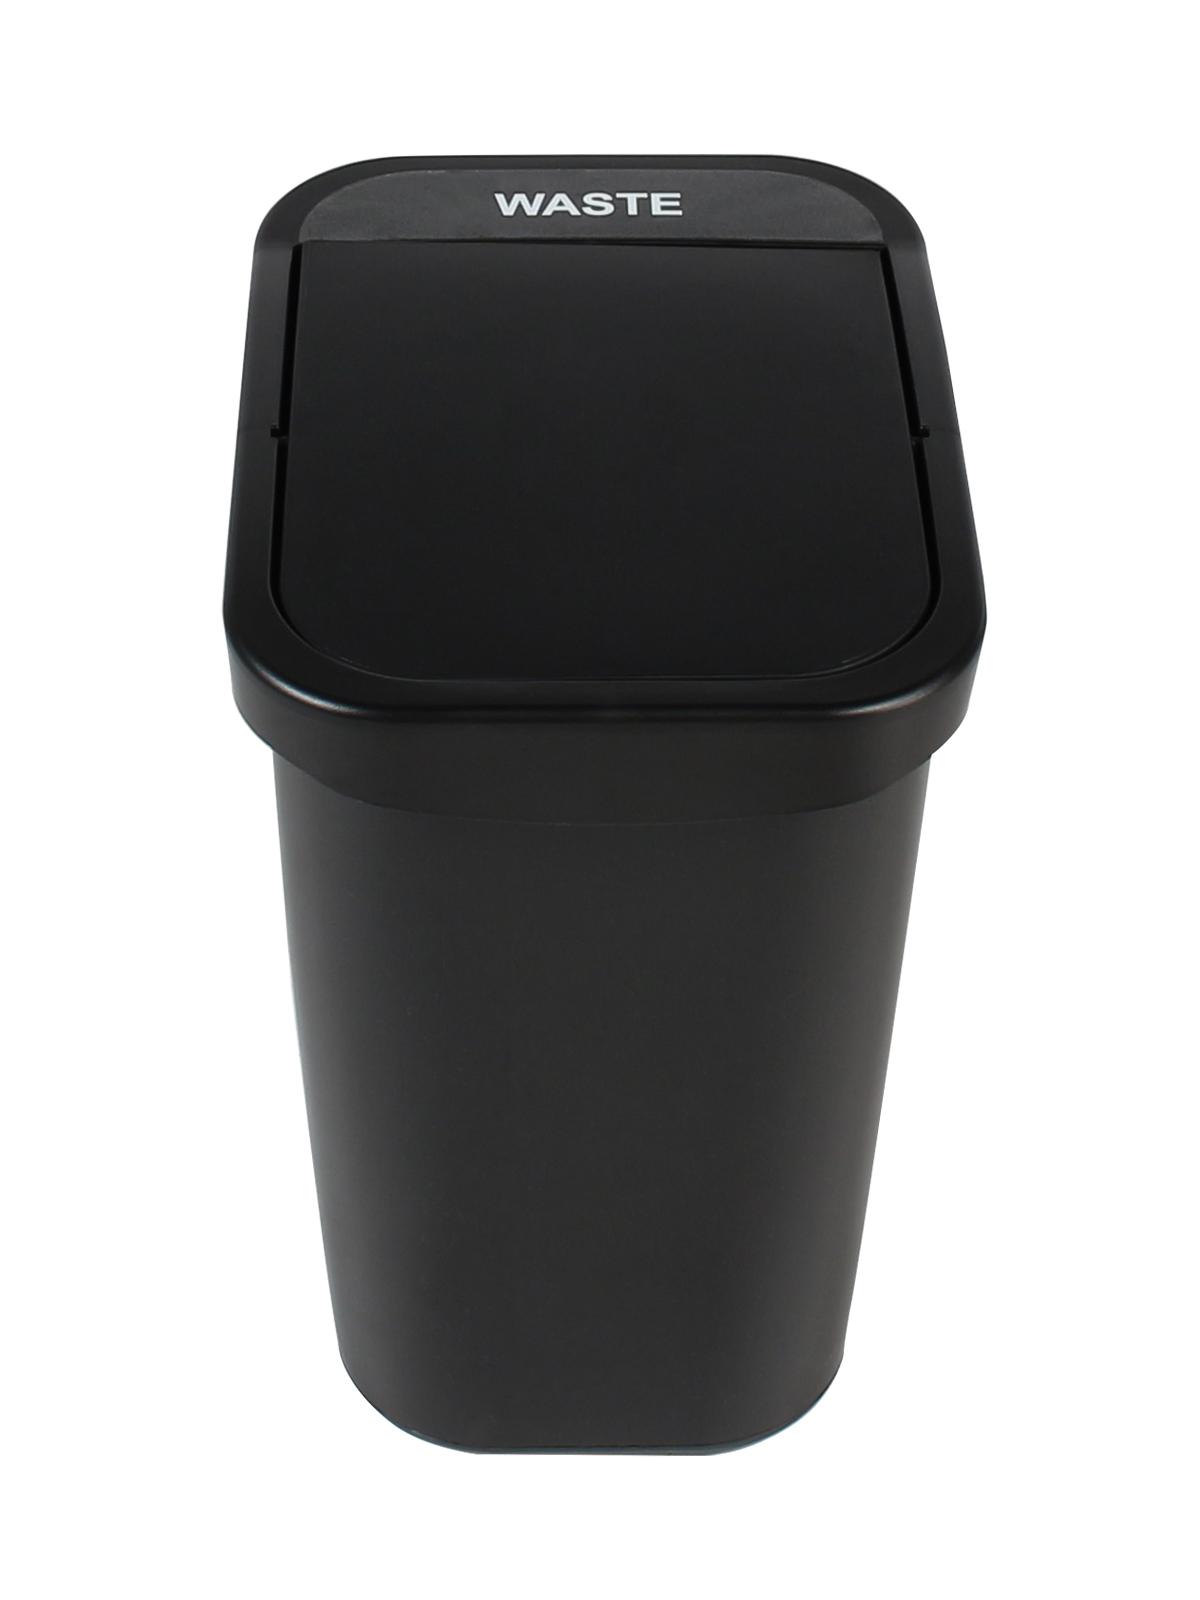 BILLI BOX - Single - 7 G - Waste - Swing - Black